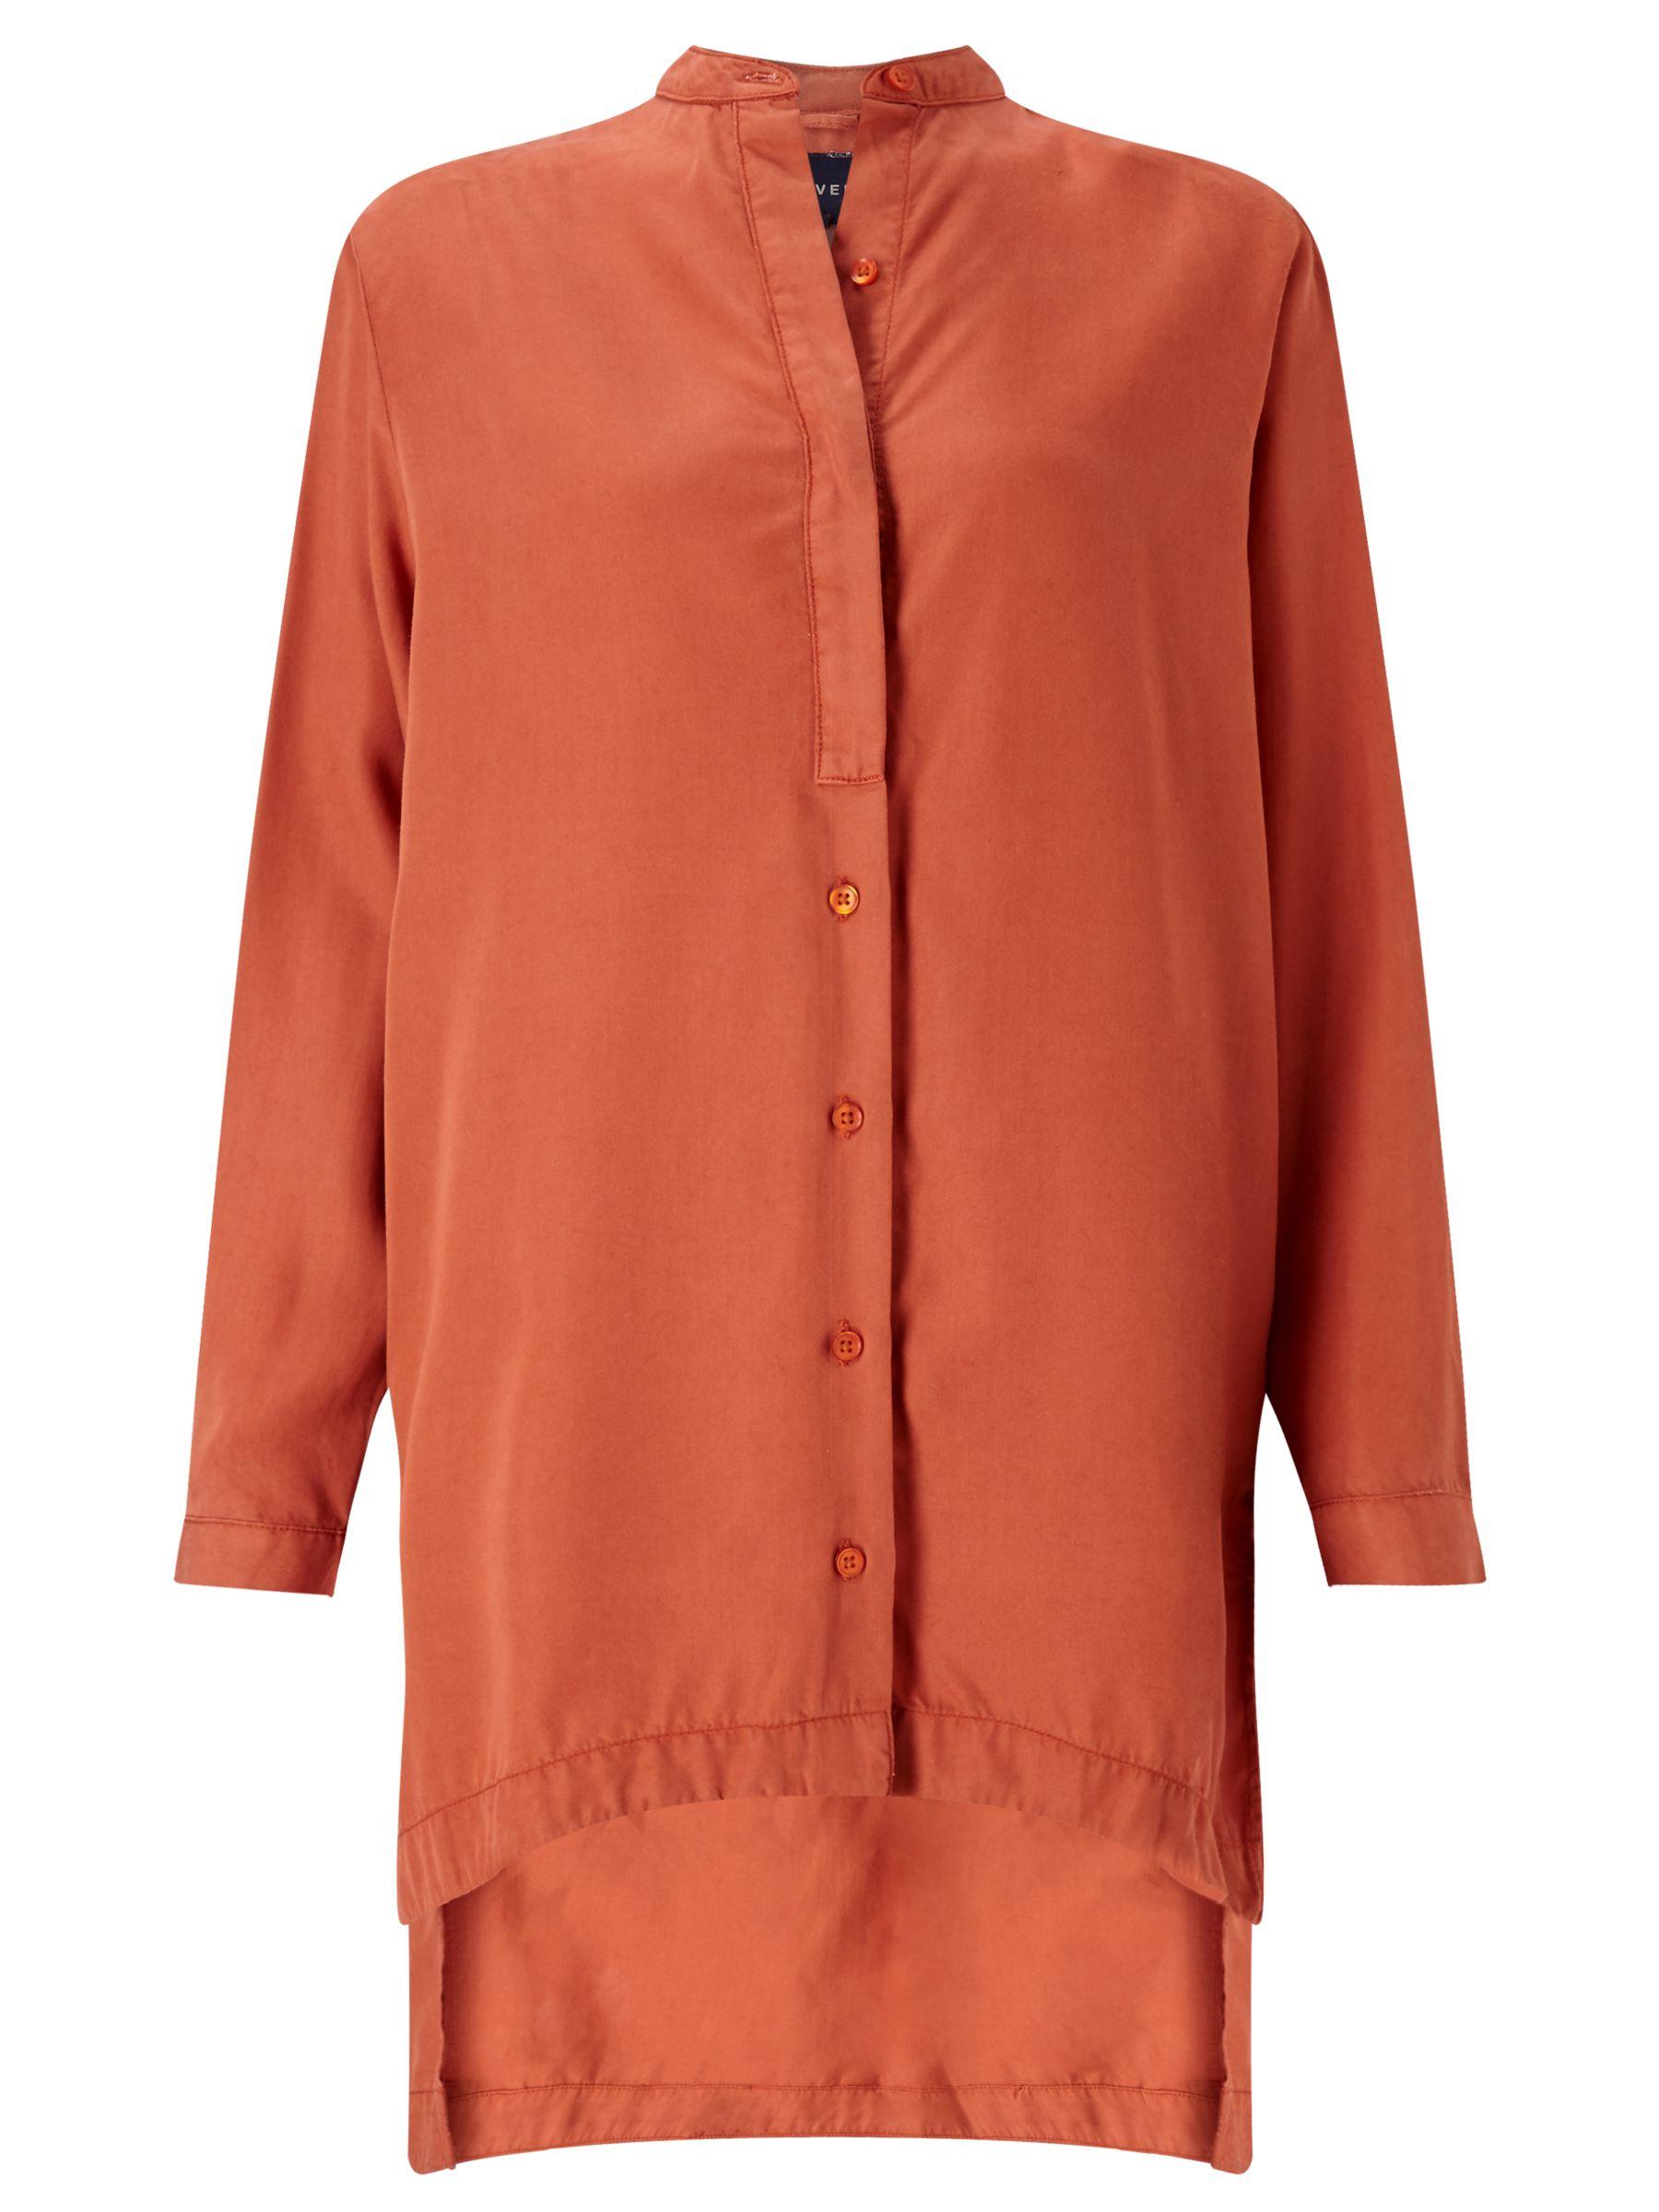 Waven Waven Agnes Tunic Top, Burnt Orange